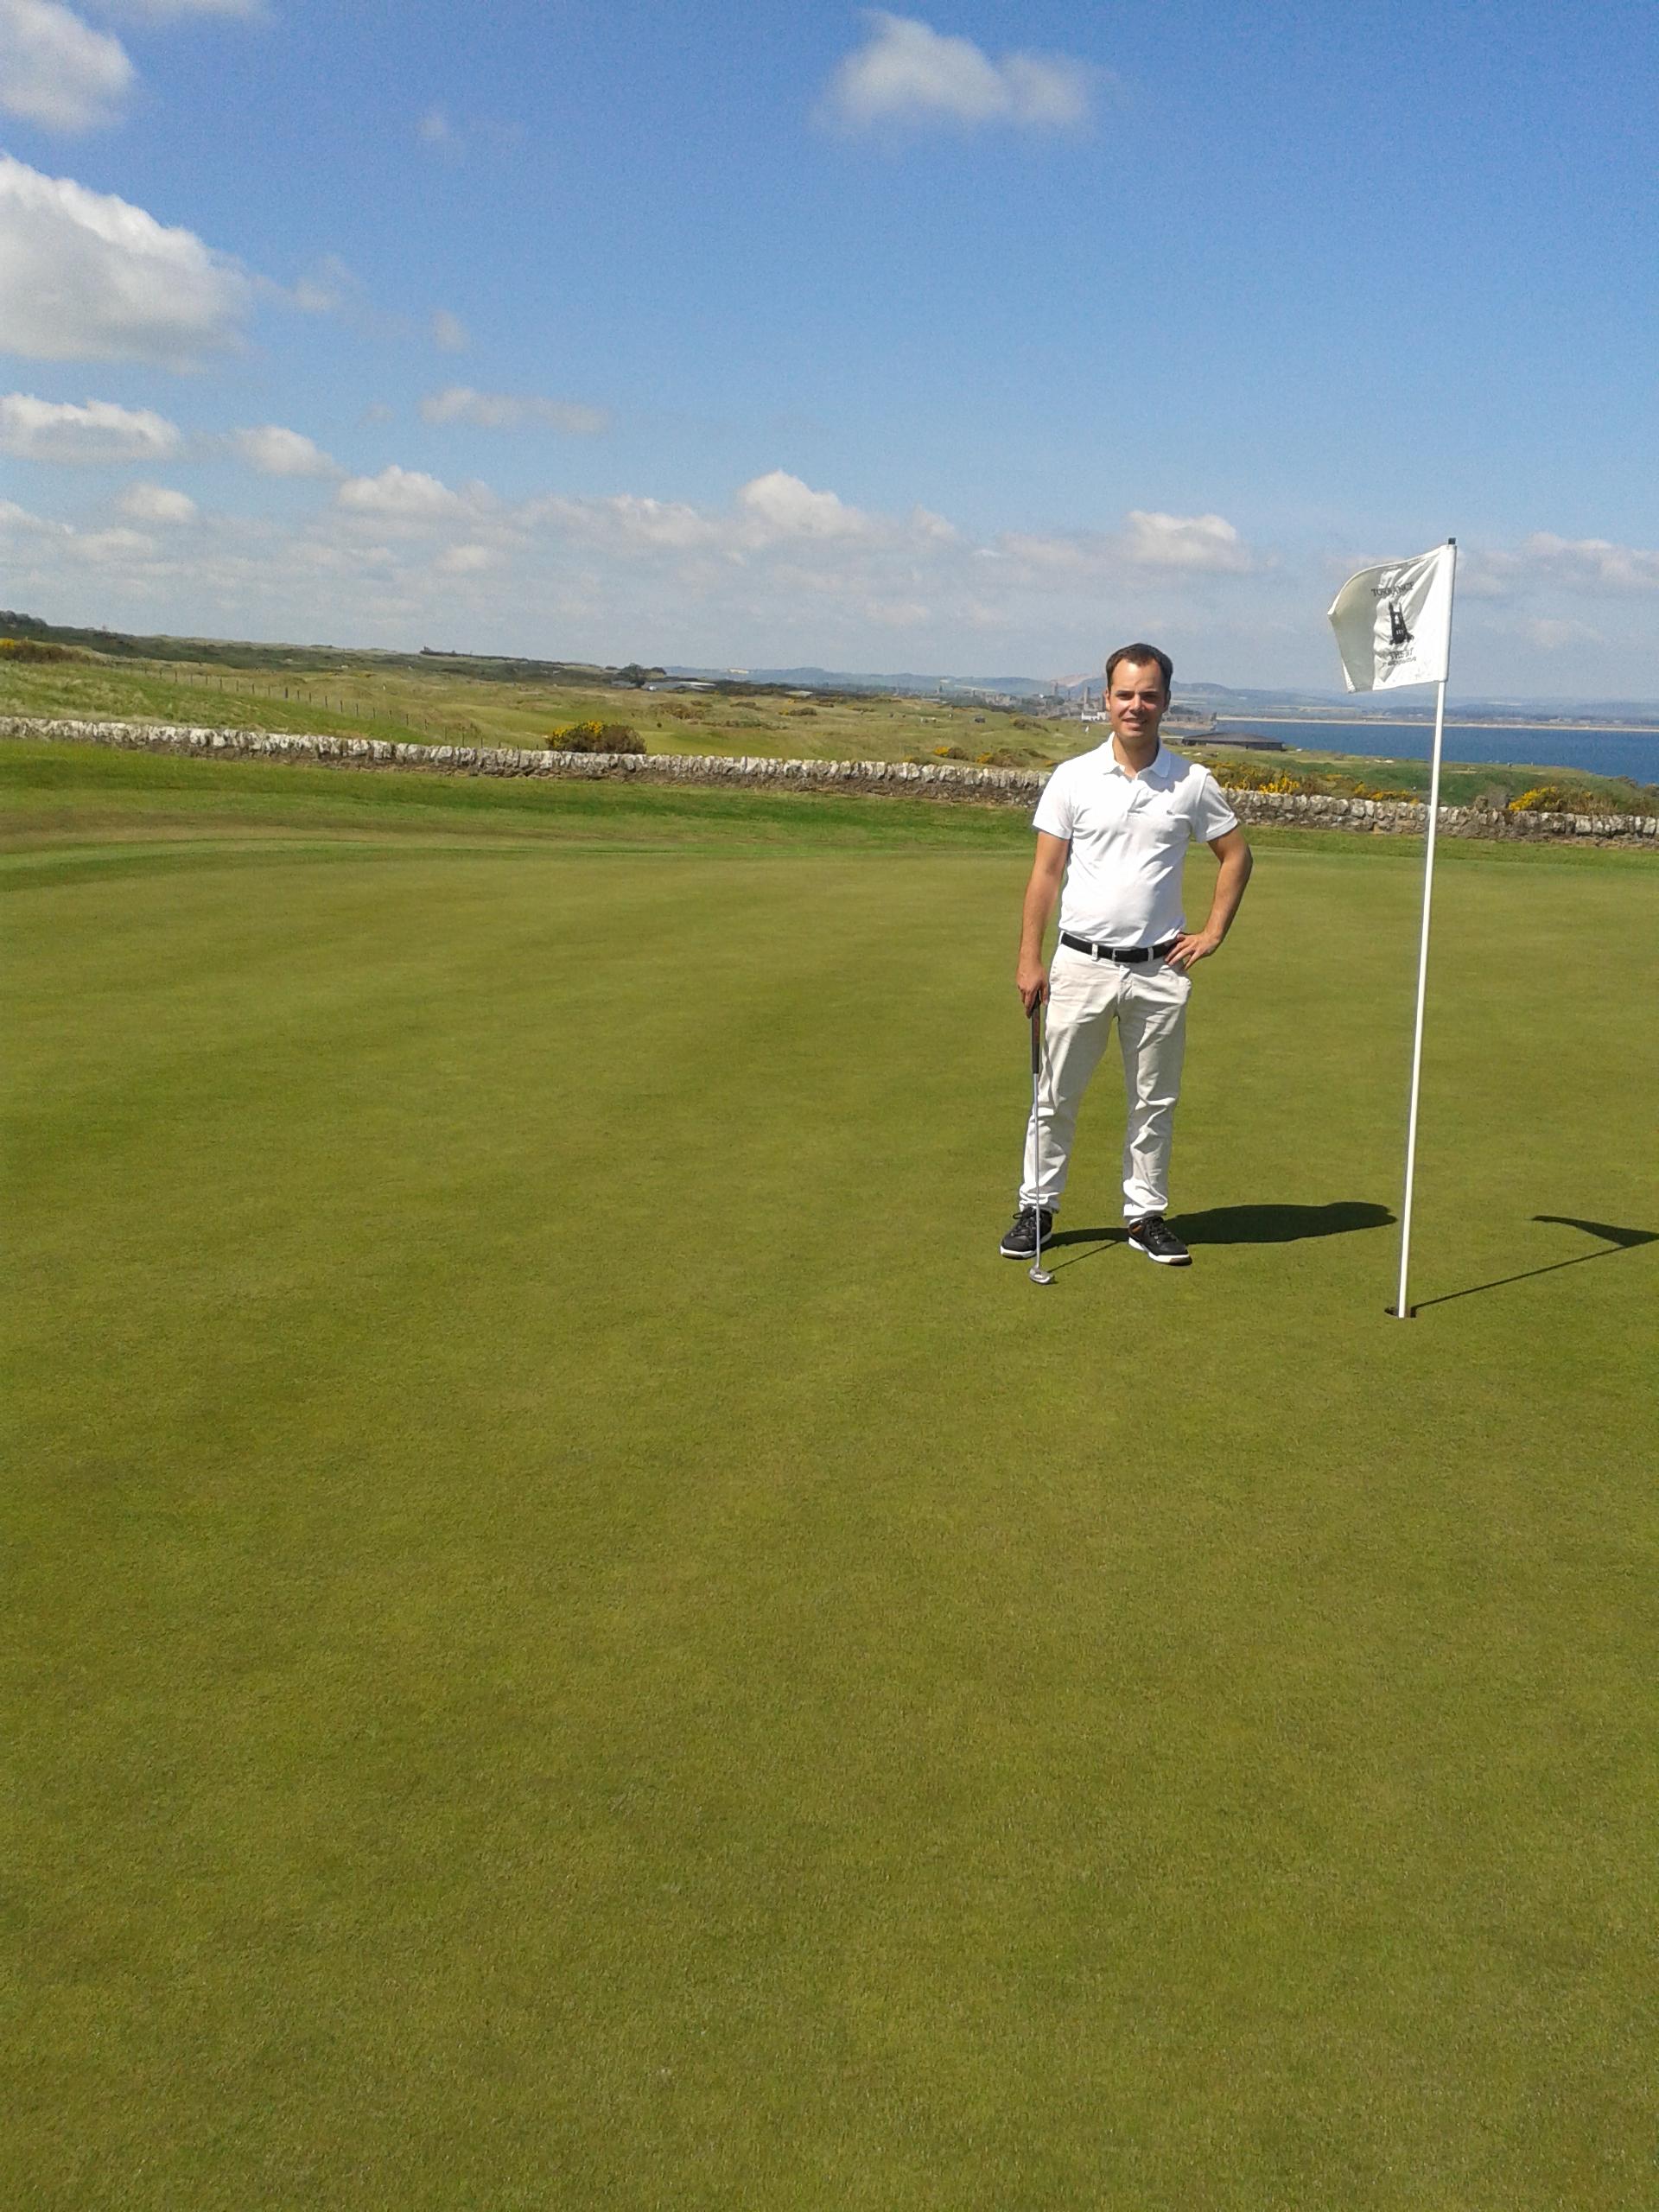 Avatar of golfer named Philipp Uhrig